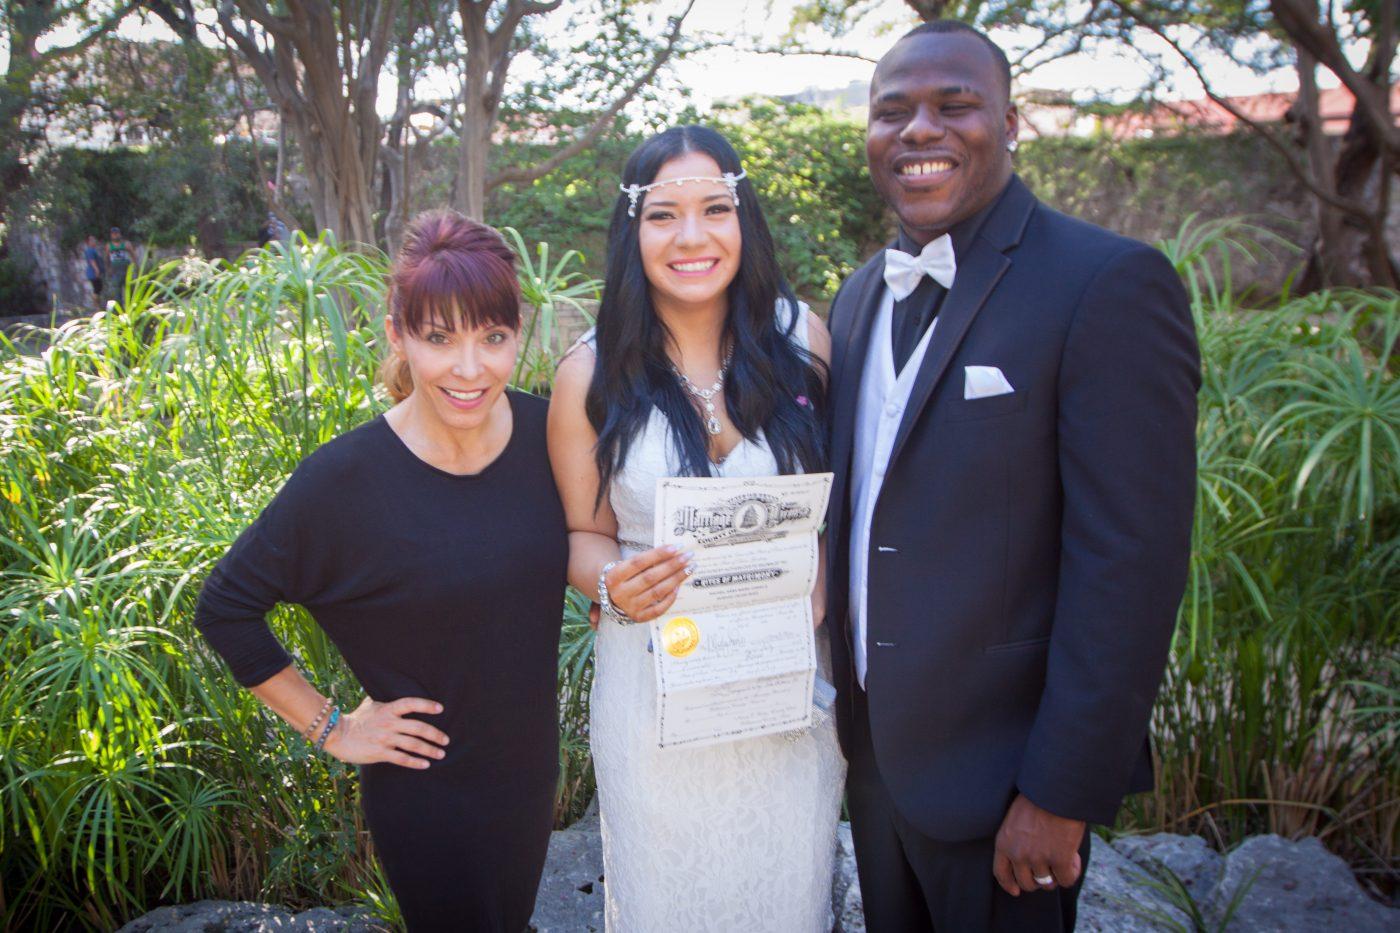 Reverend Janie Terrazas, Texas Wedding Ministers, Wedding Officiant, Wedding Minister